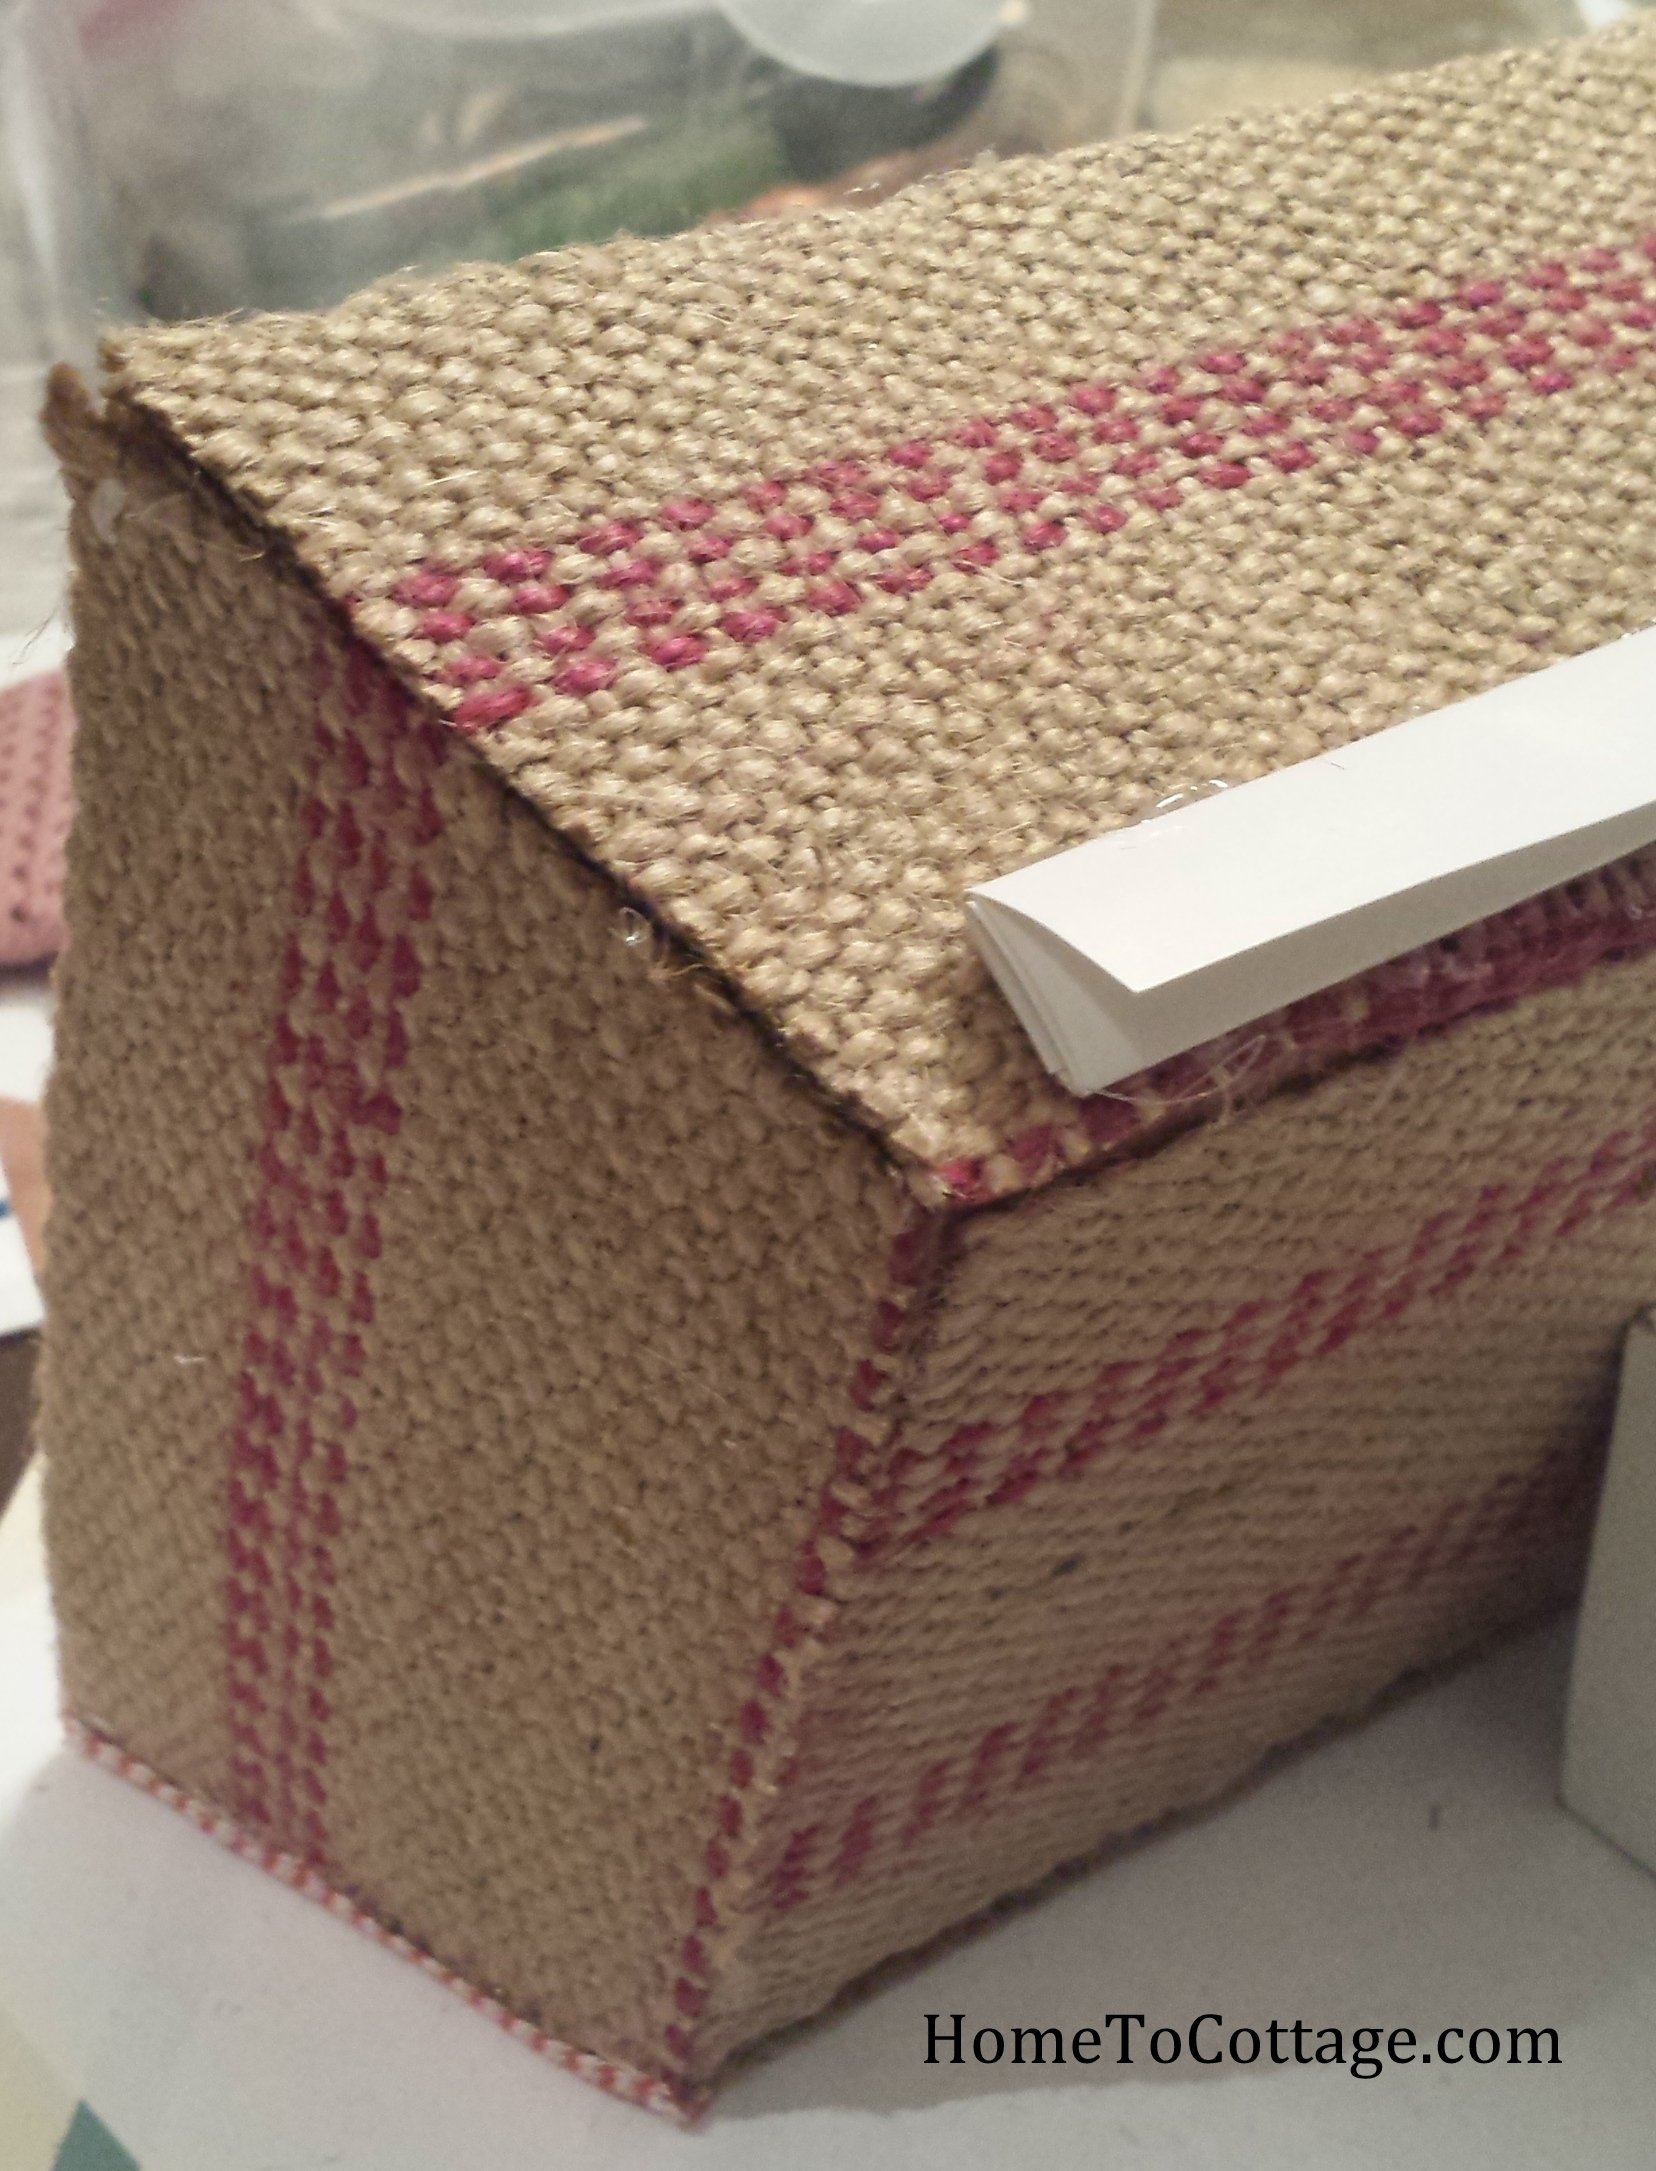 4 HomeToCottage.com diorama cardstock wedge glued on bottom